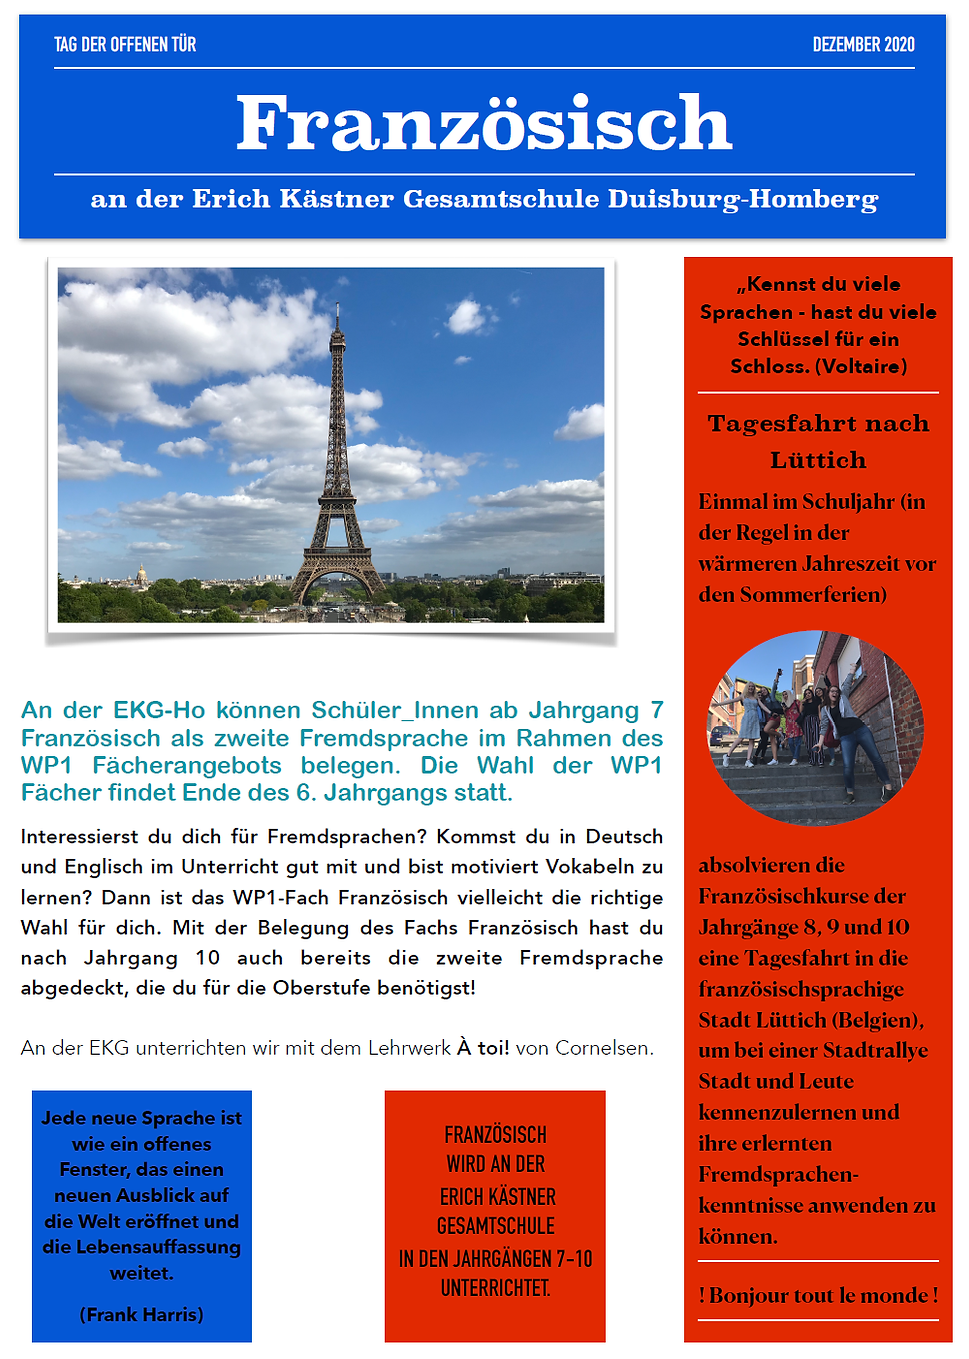 Französich ToT Flyer.png